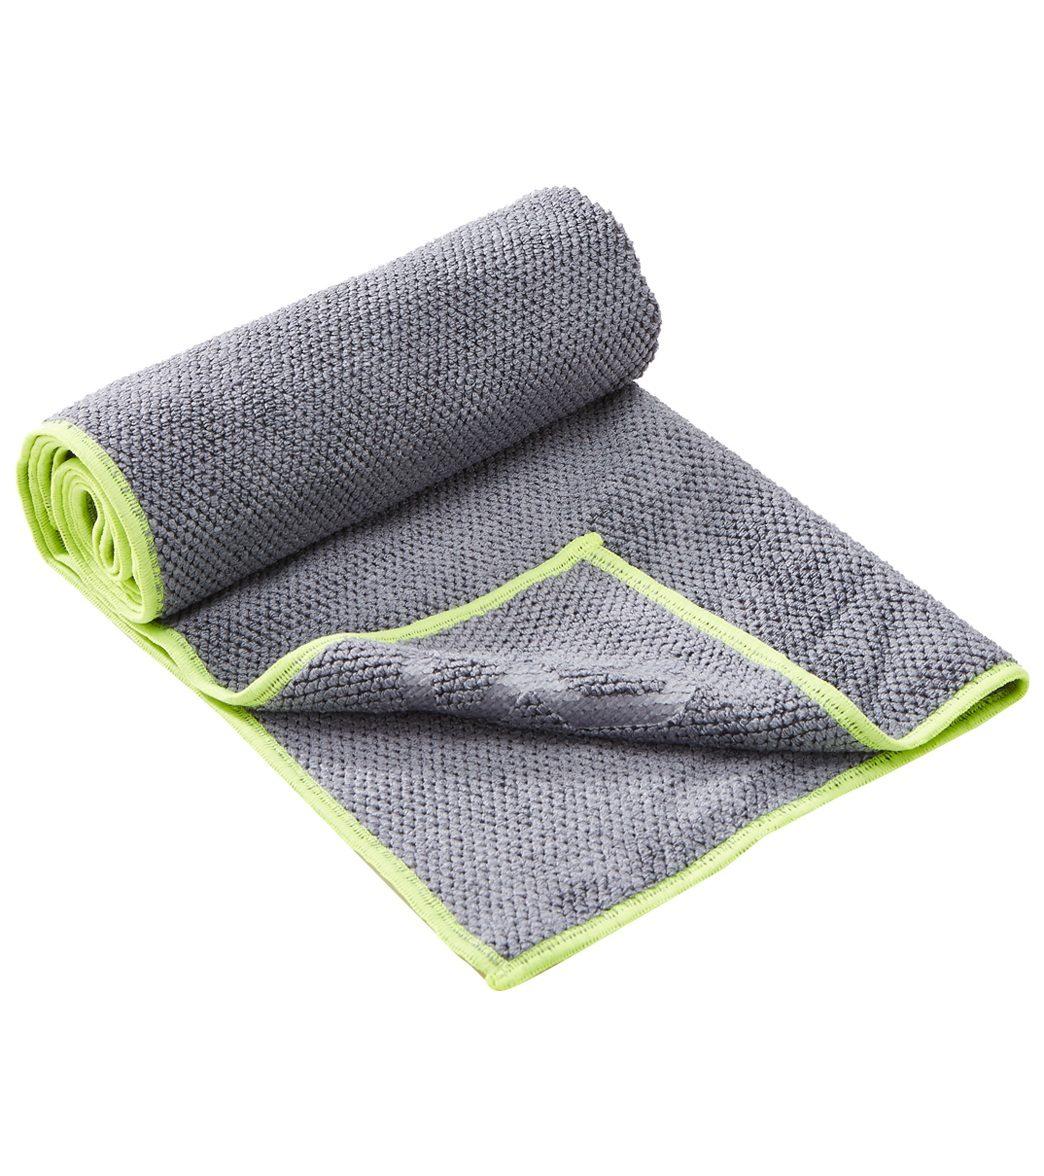 Blue Maru Aqua Dry Sports Towel